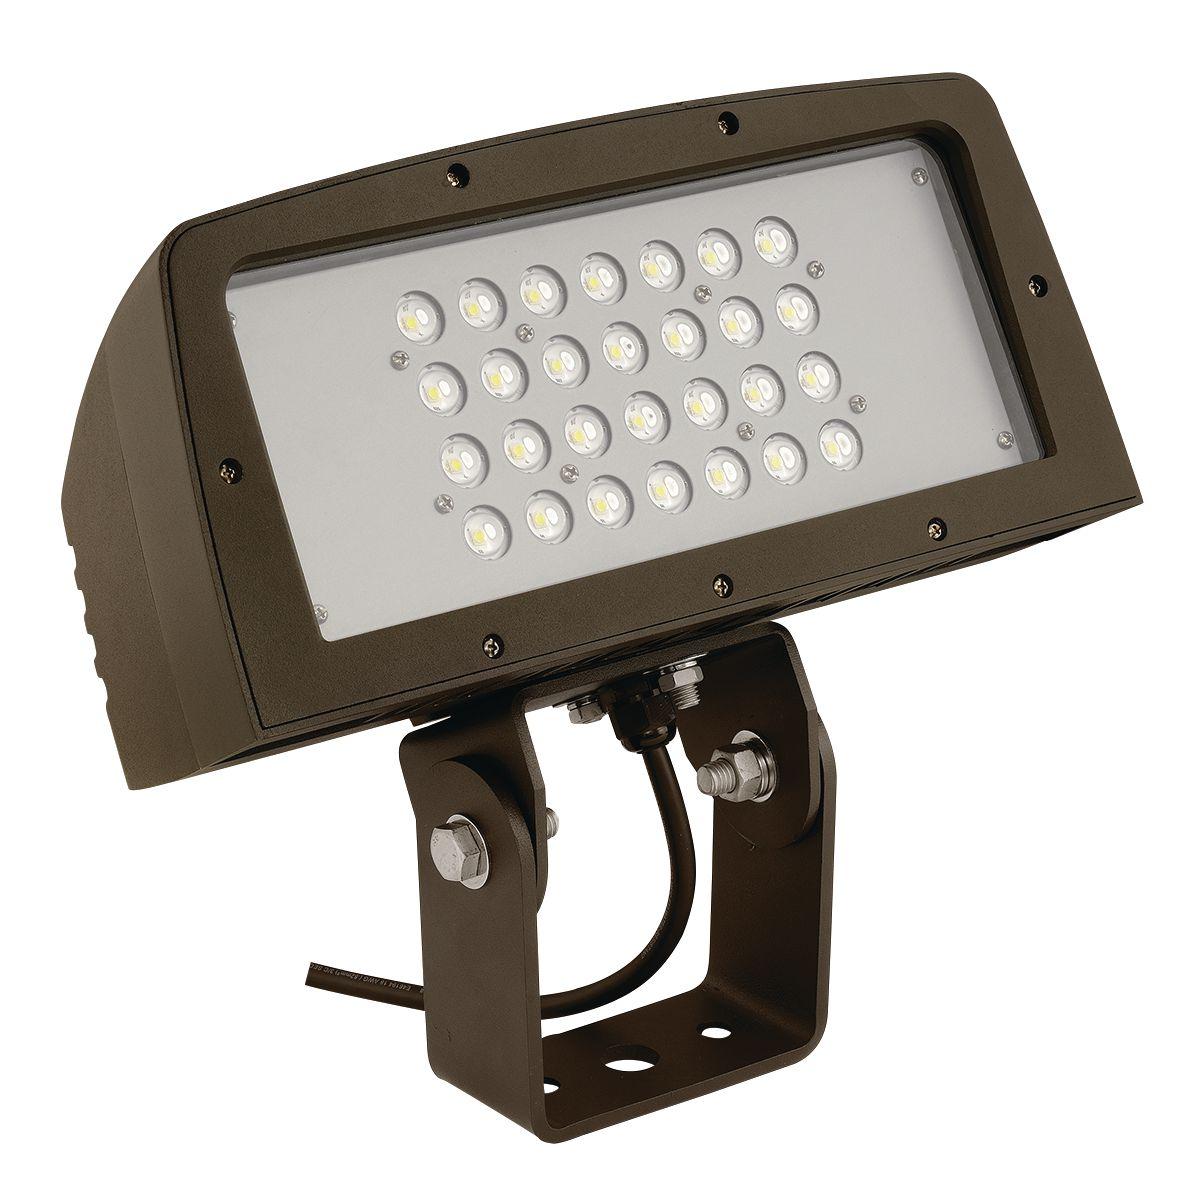 Fll Factor Floodlight Brand Hubbell Outdoor Lighting